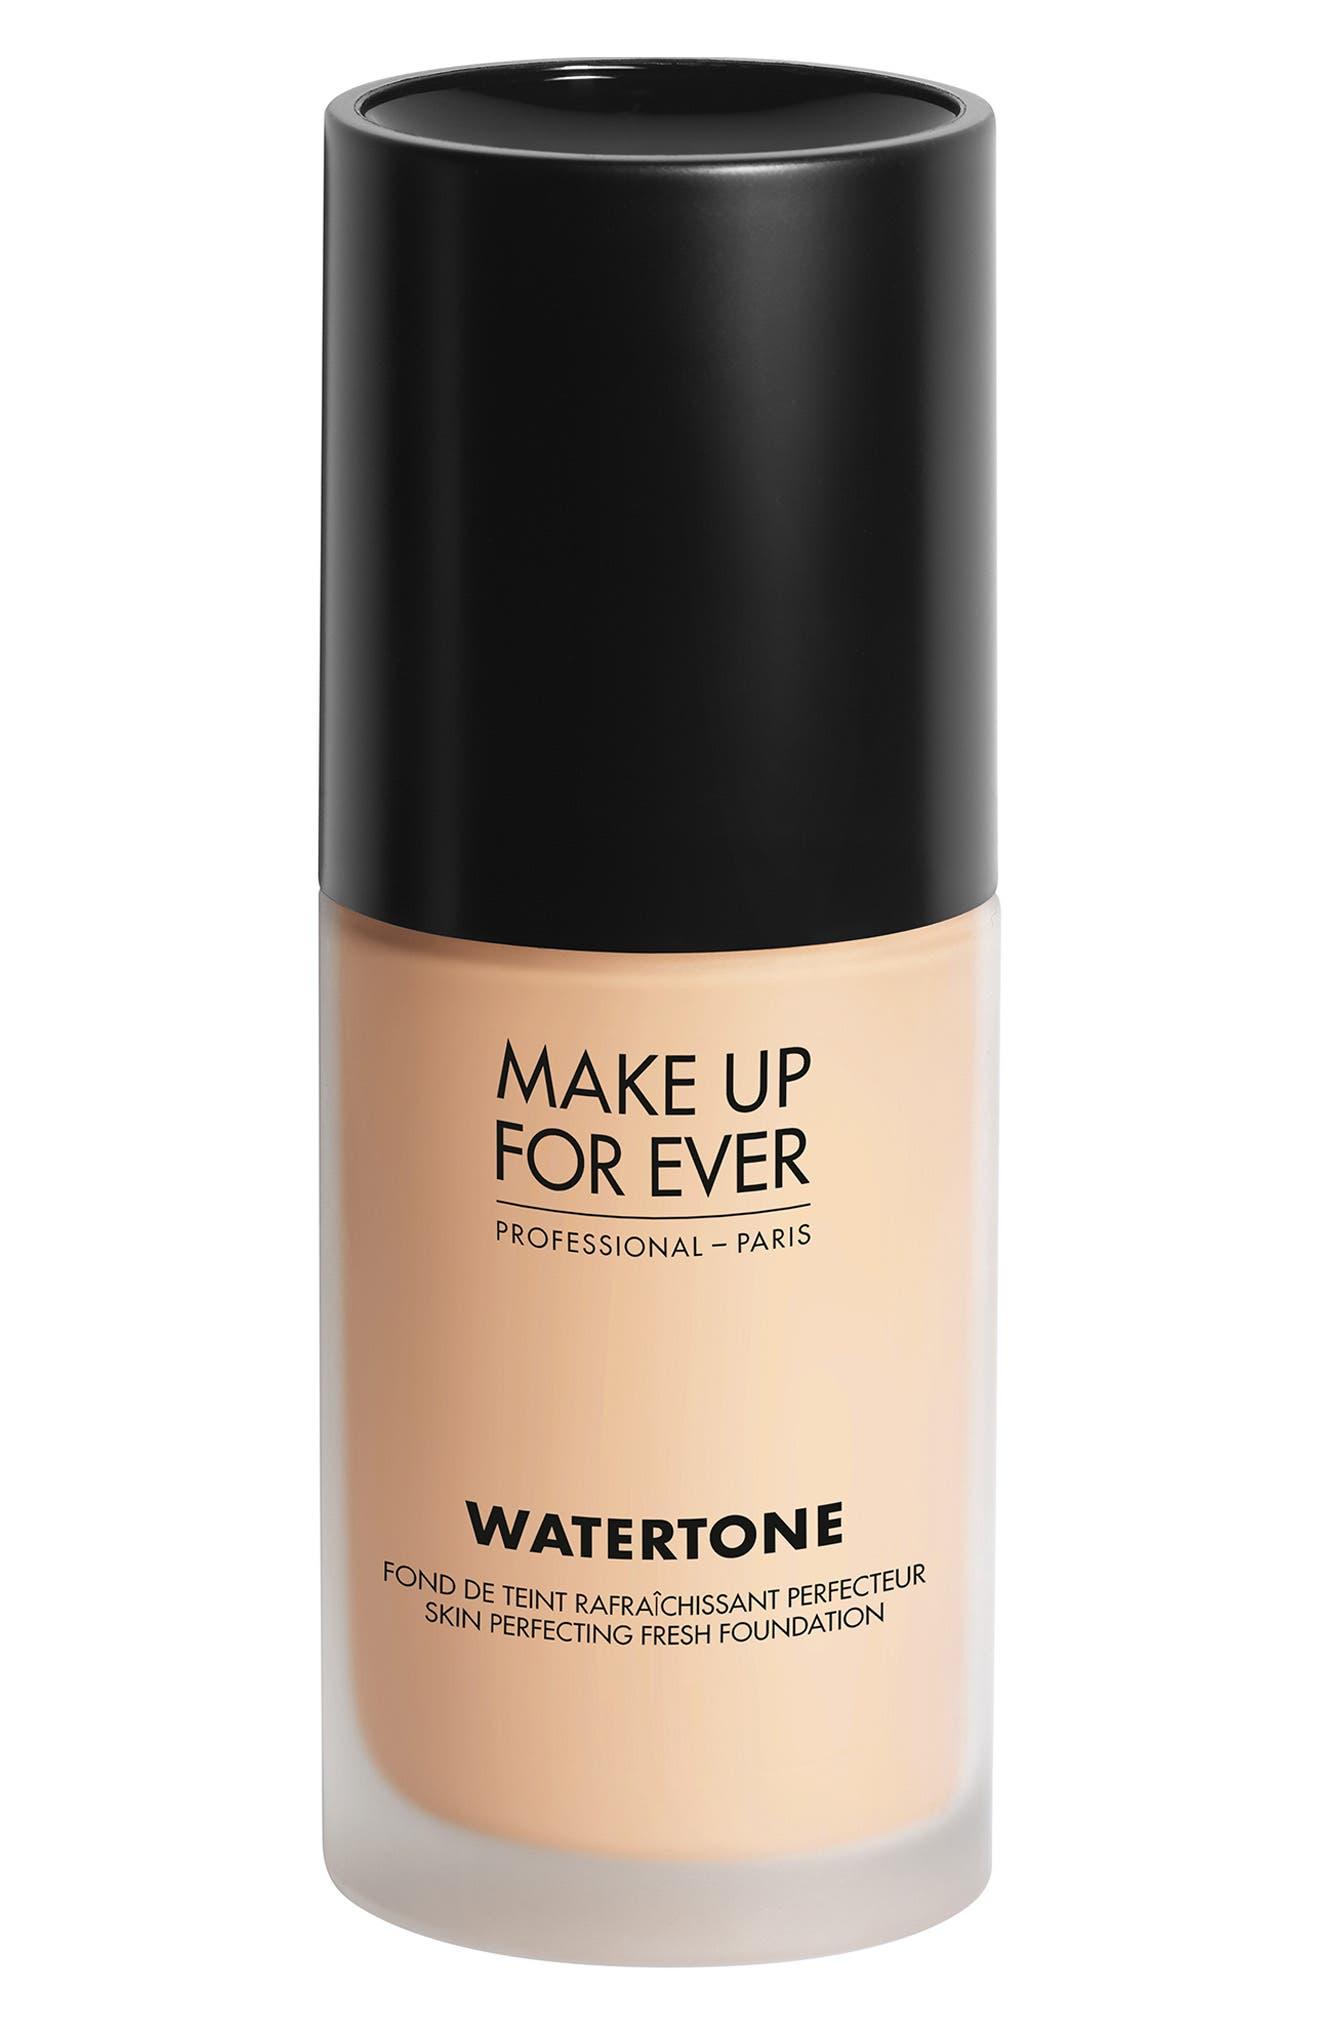 Watertone Skin-Perfecting Tint Foundation